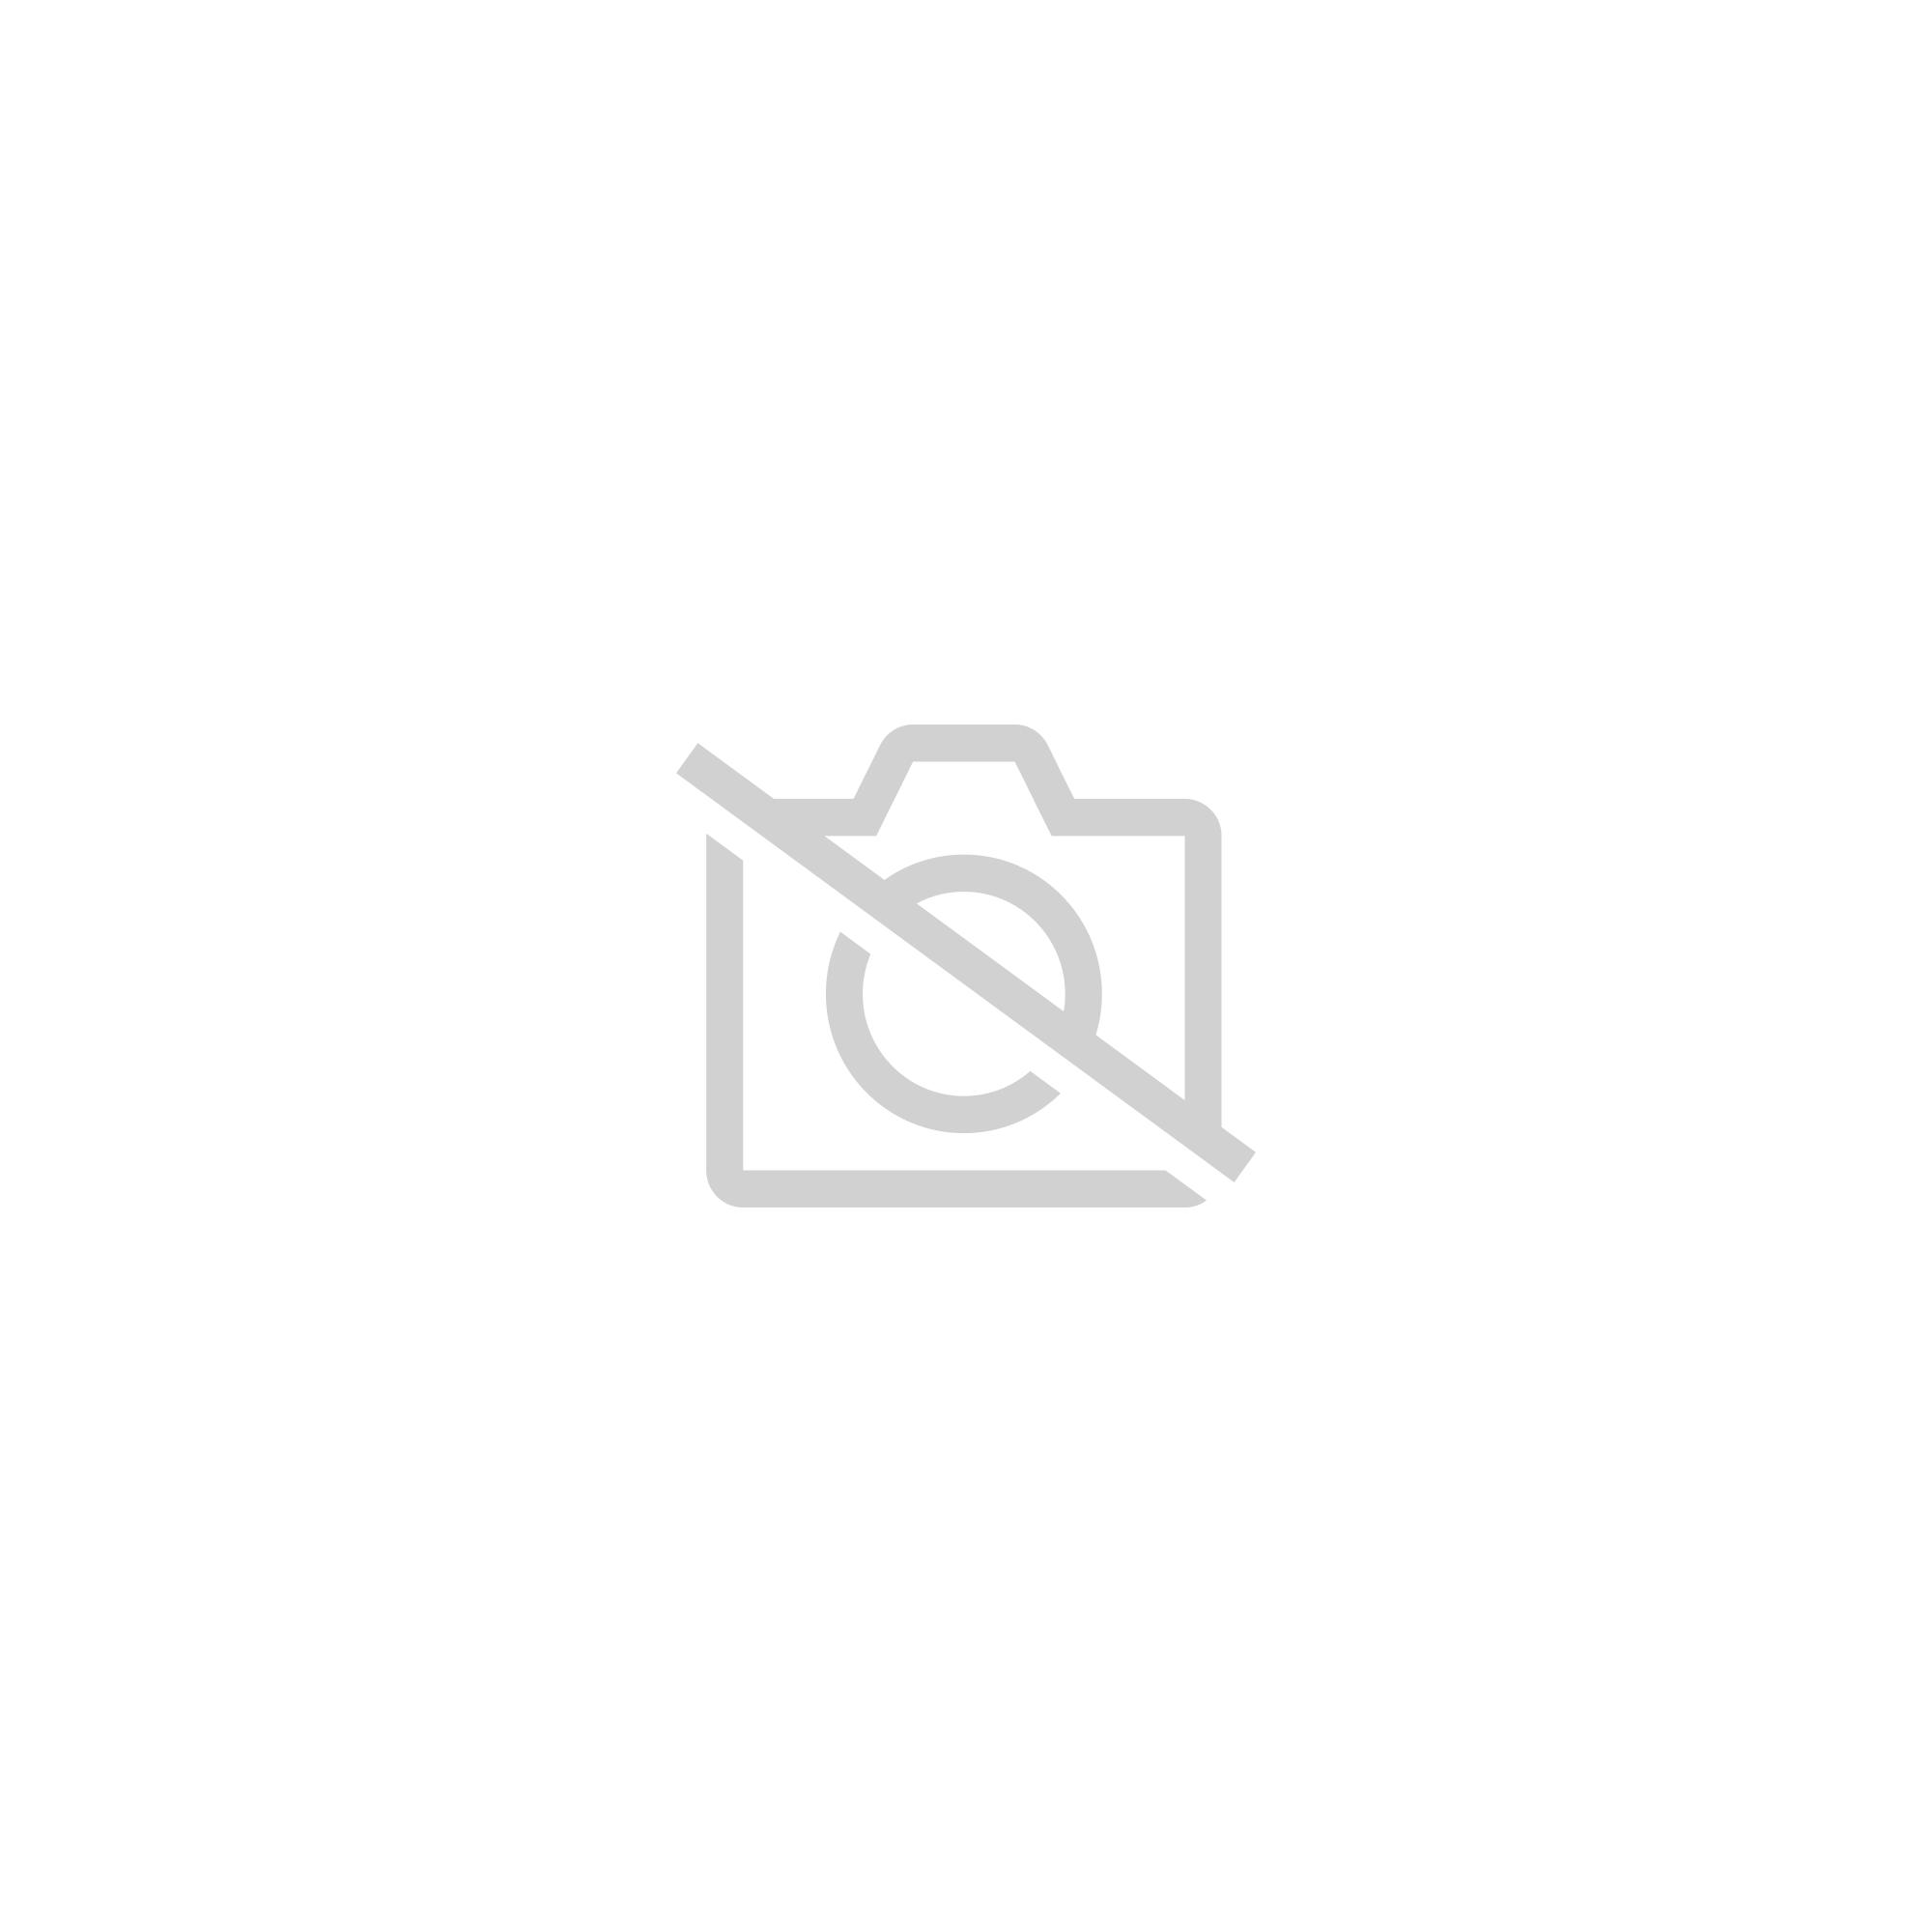 Chaussures pour Femme Achat, Vente Neuf   d Occasion - Rakuten eff1e11f42c